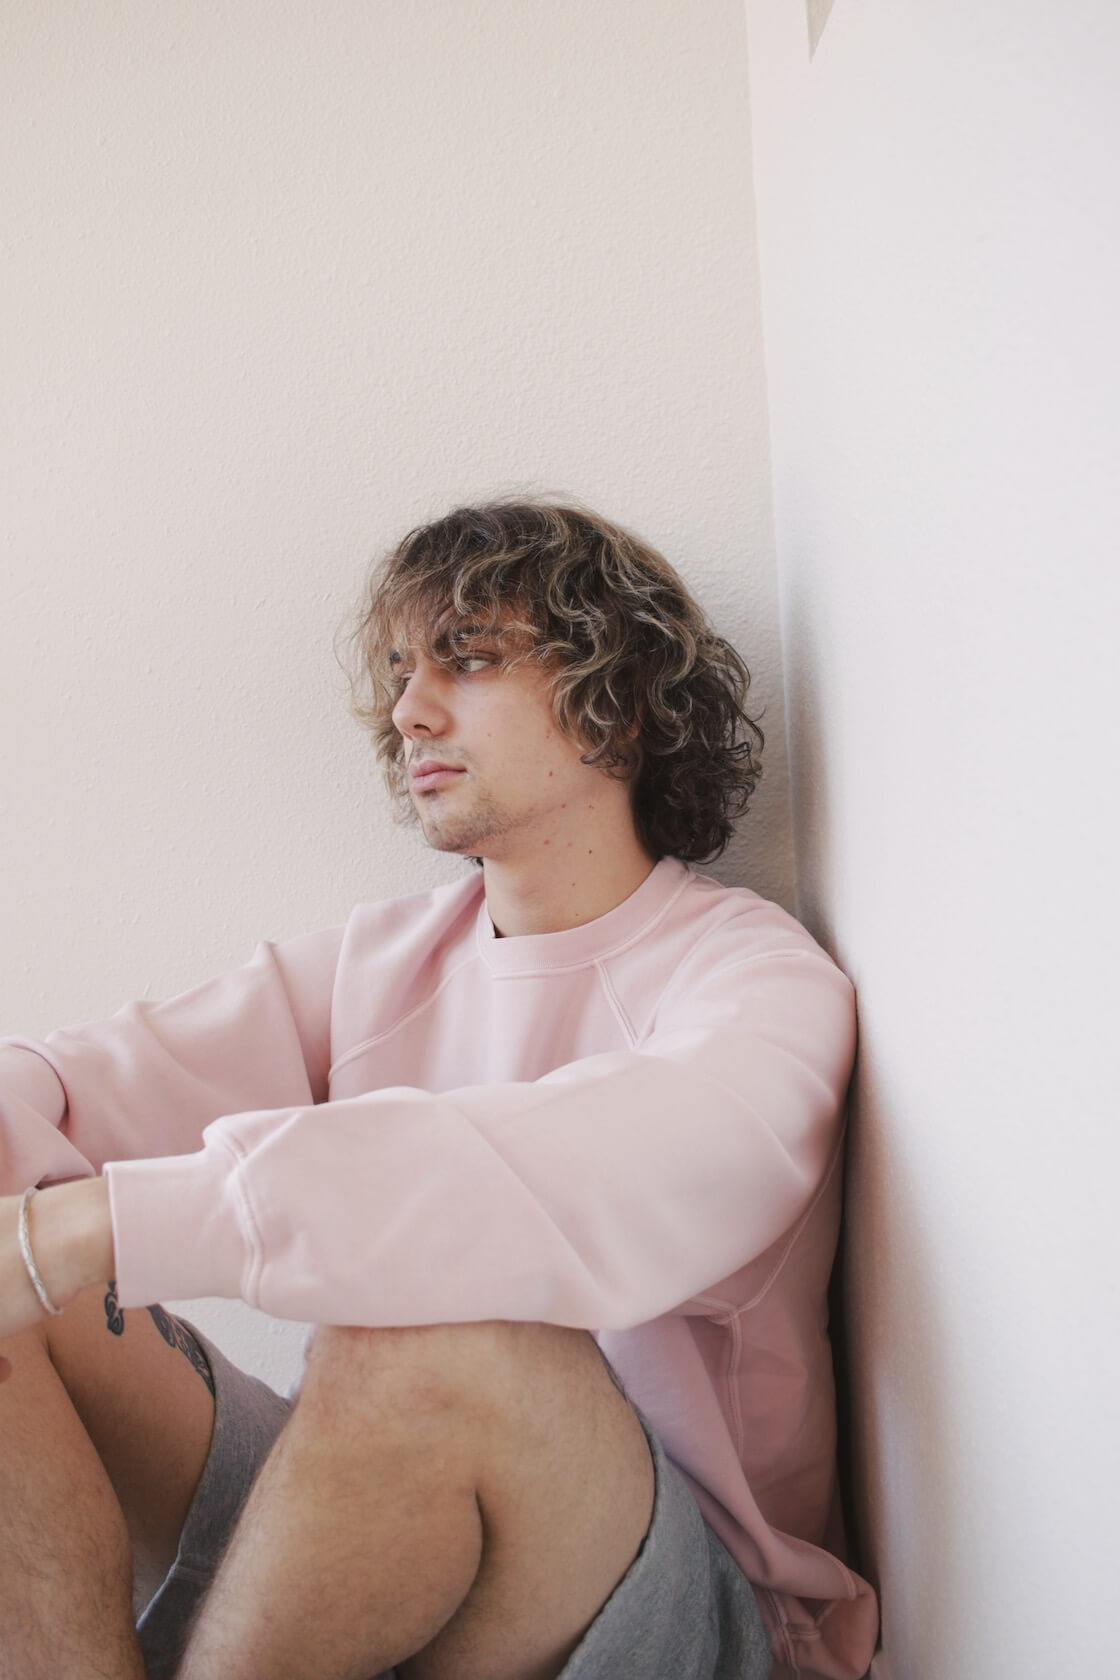 canoe club x lady white co. collaboration eraser pink jacob sweatshirt on body